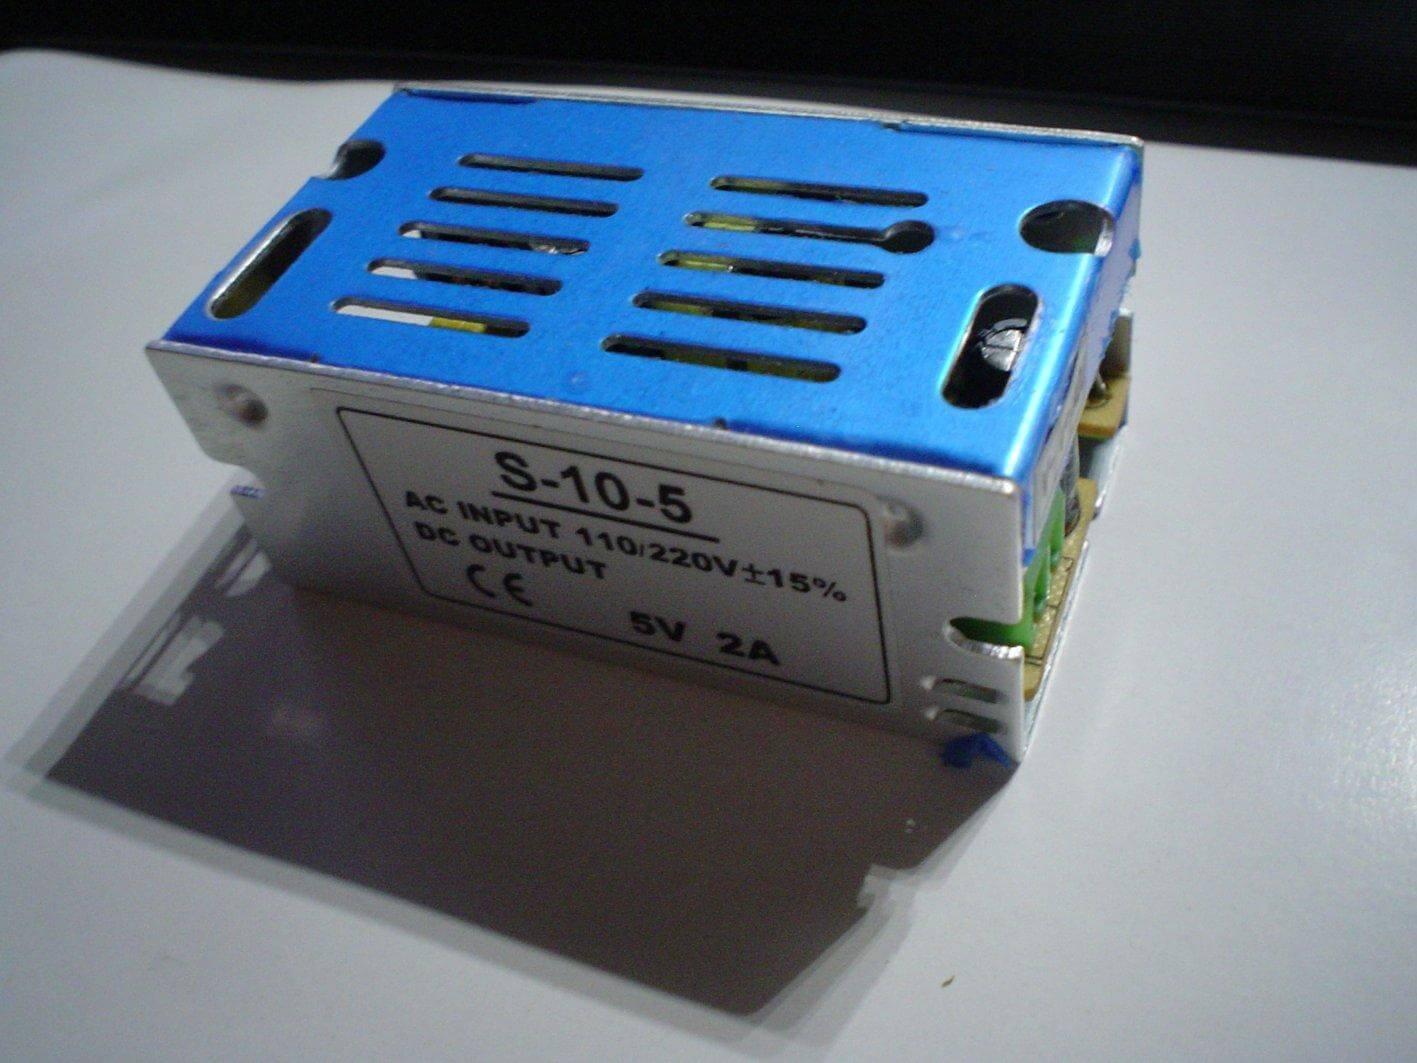 Alimentation de chez DX capable de transformer du 220V AC en 5V DC (2A max)